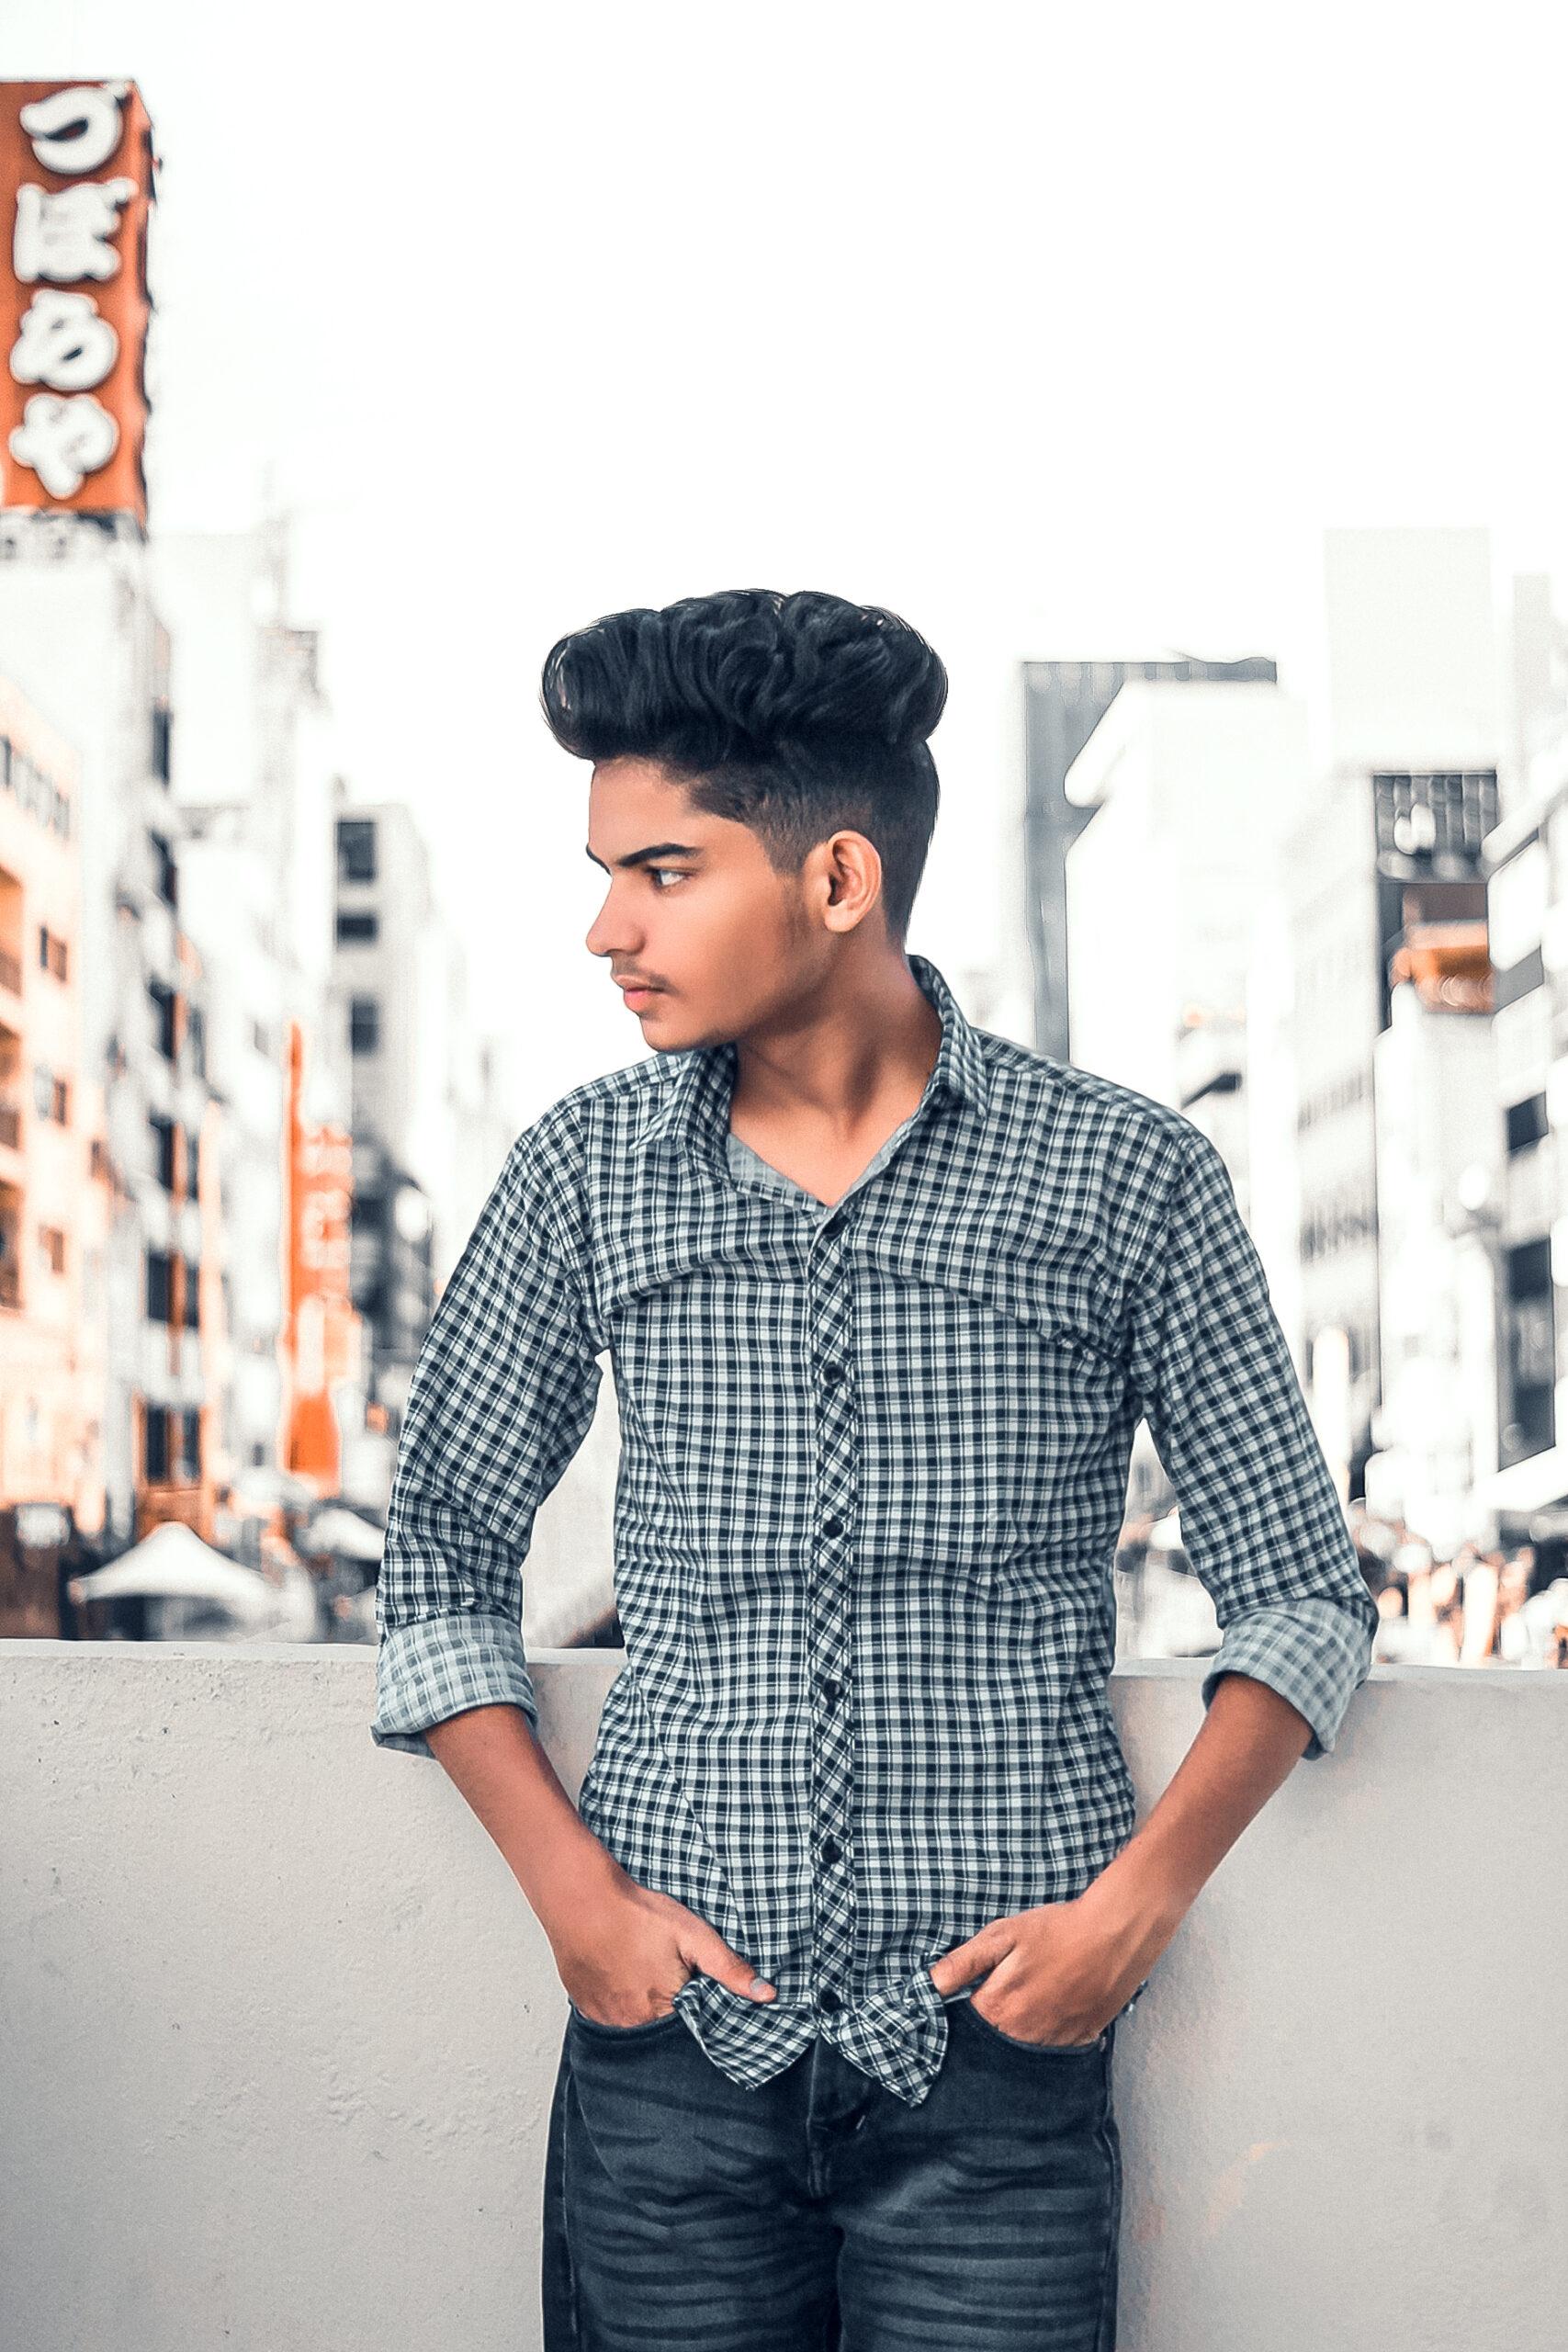 Meet one of the best Young Digital Marketing expert of India: Ahad Khaleeq